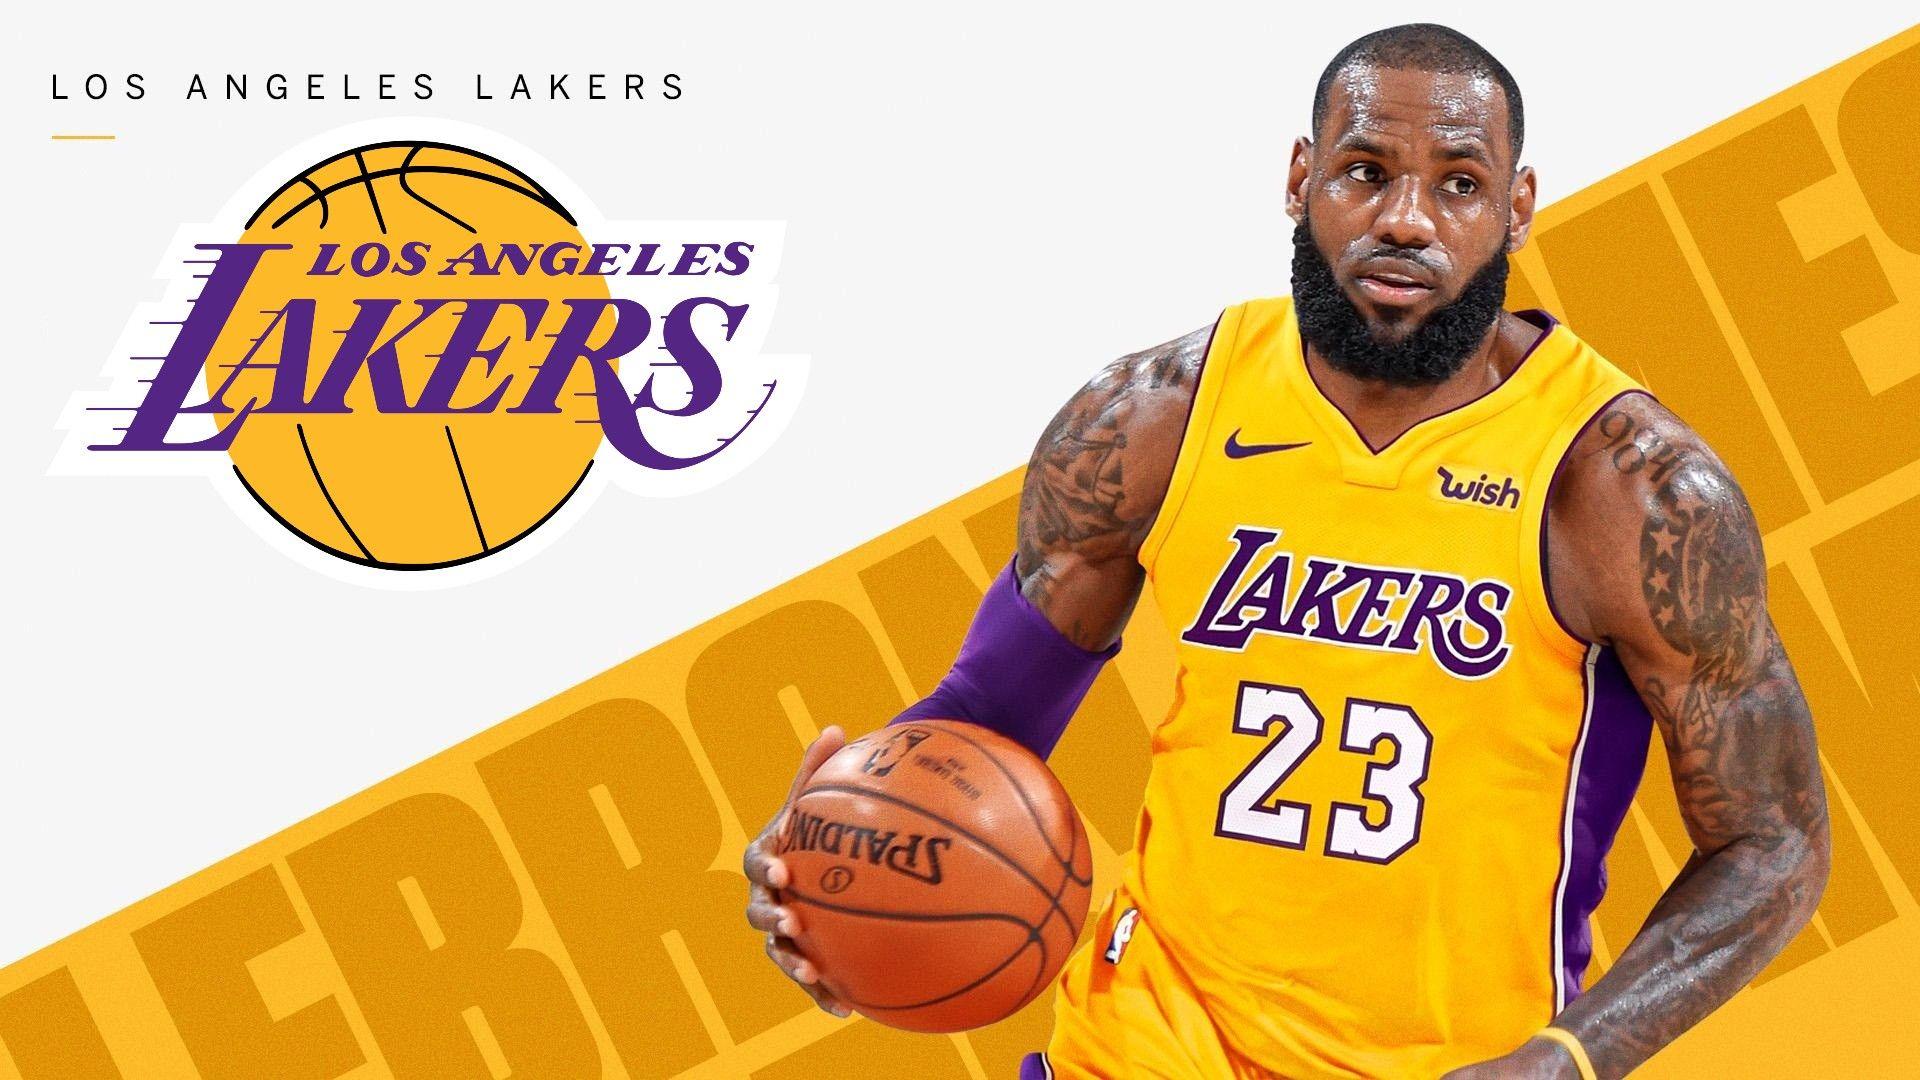 Lebron James Lakers Wallpaper Hd Lebron James Lakers Lebron James Lakers